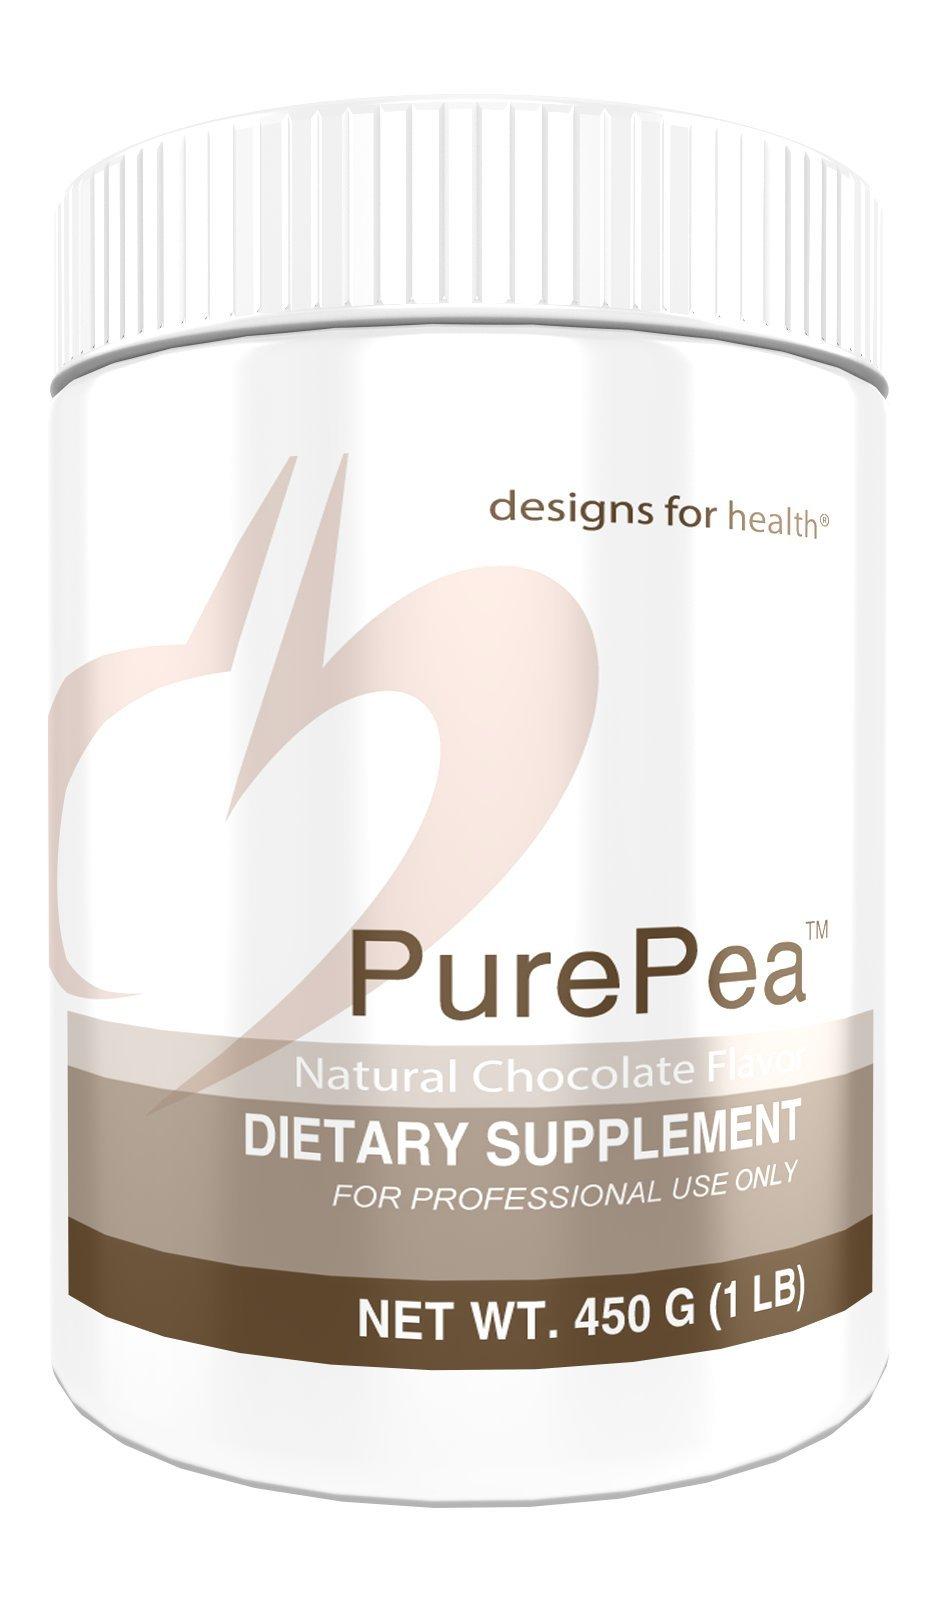 Designs for Health PurePea - Chocolate Pea Protein Powder, 20 Grams Vegan Protein with Non-GMO Peas (15 Servings, 450 Grams) by designs for health